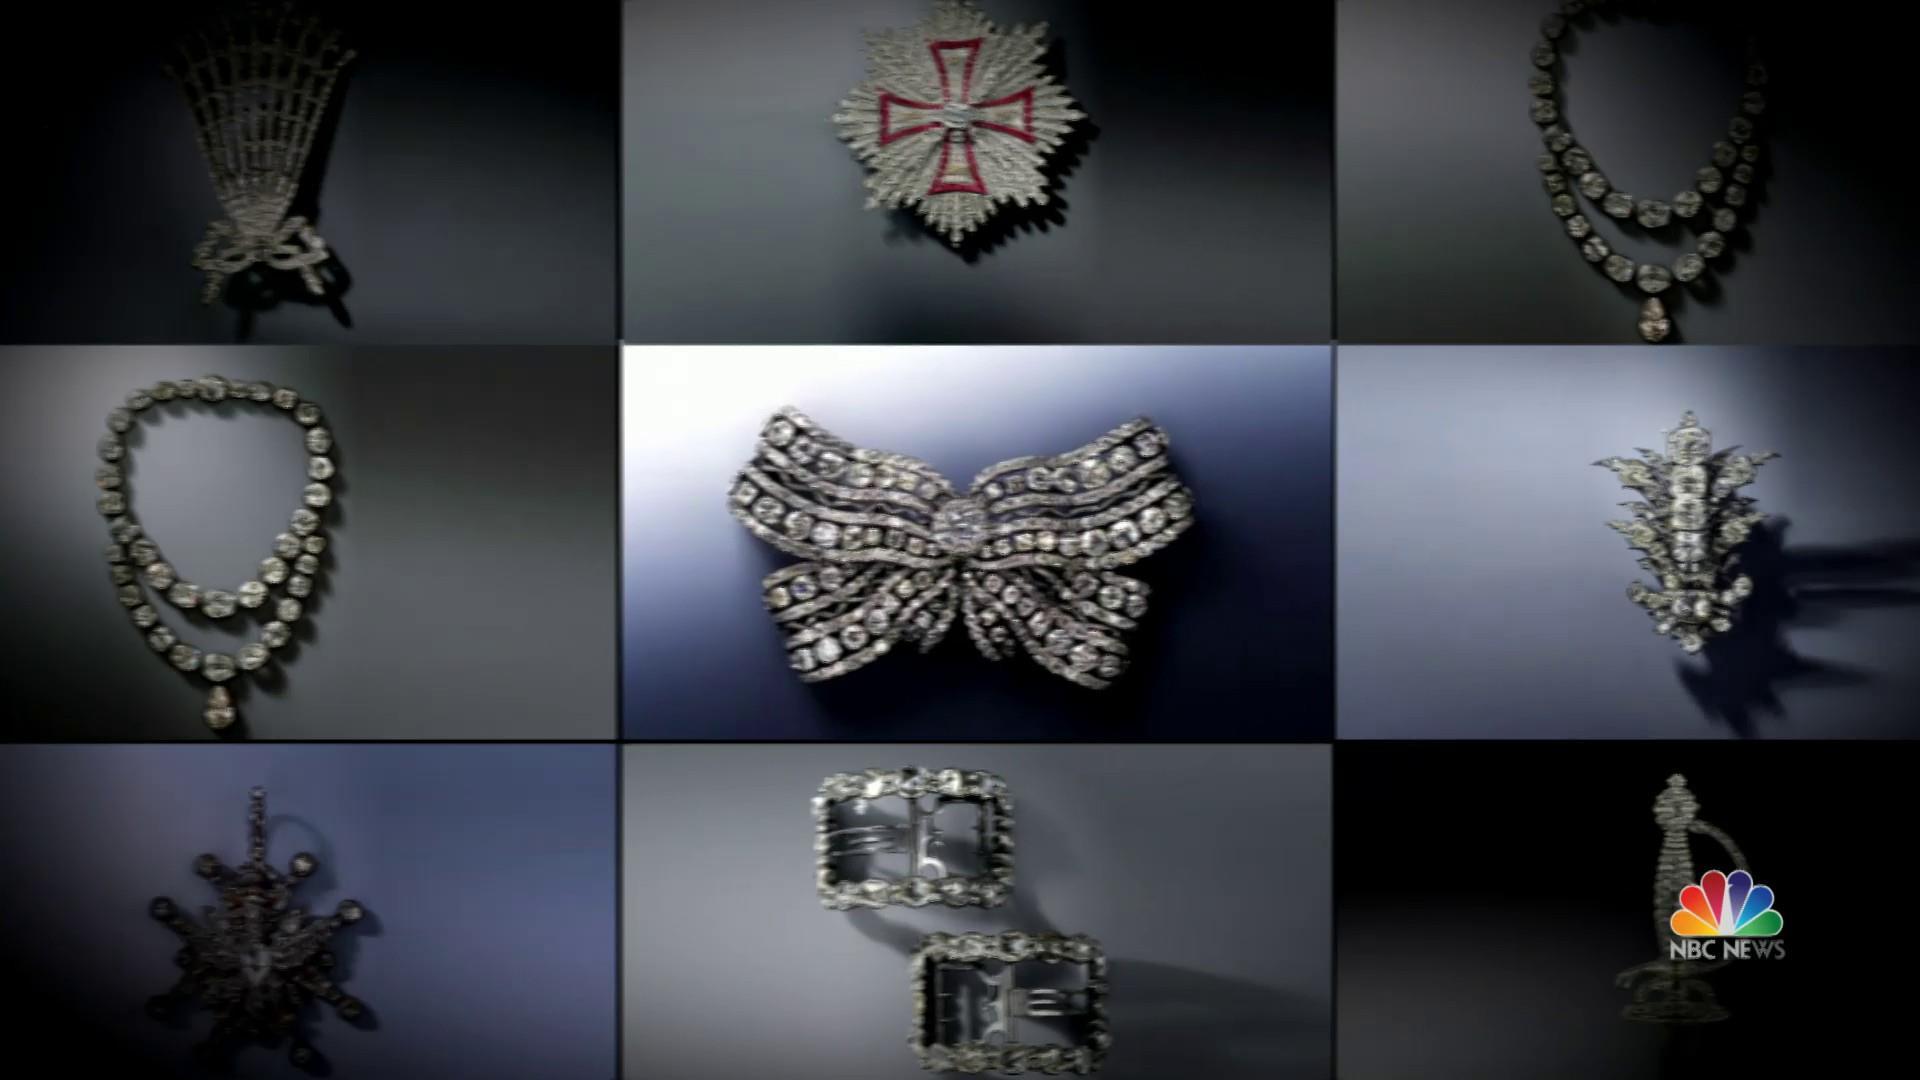 German jewel heist thieves walked off with 49 carat diamond, authorities confirm